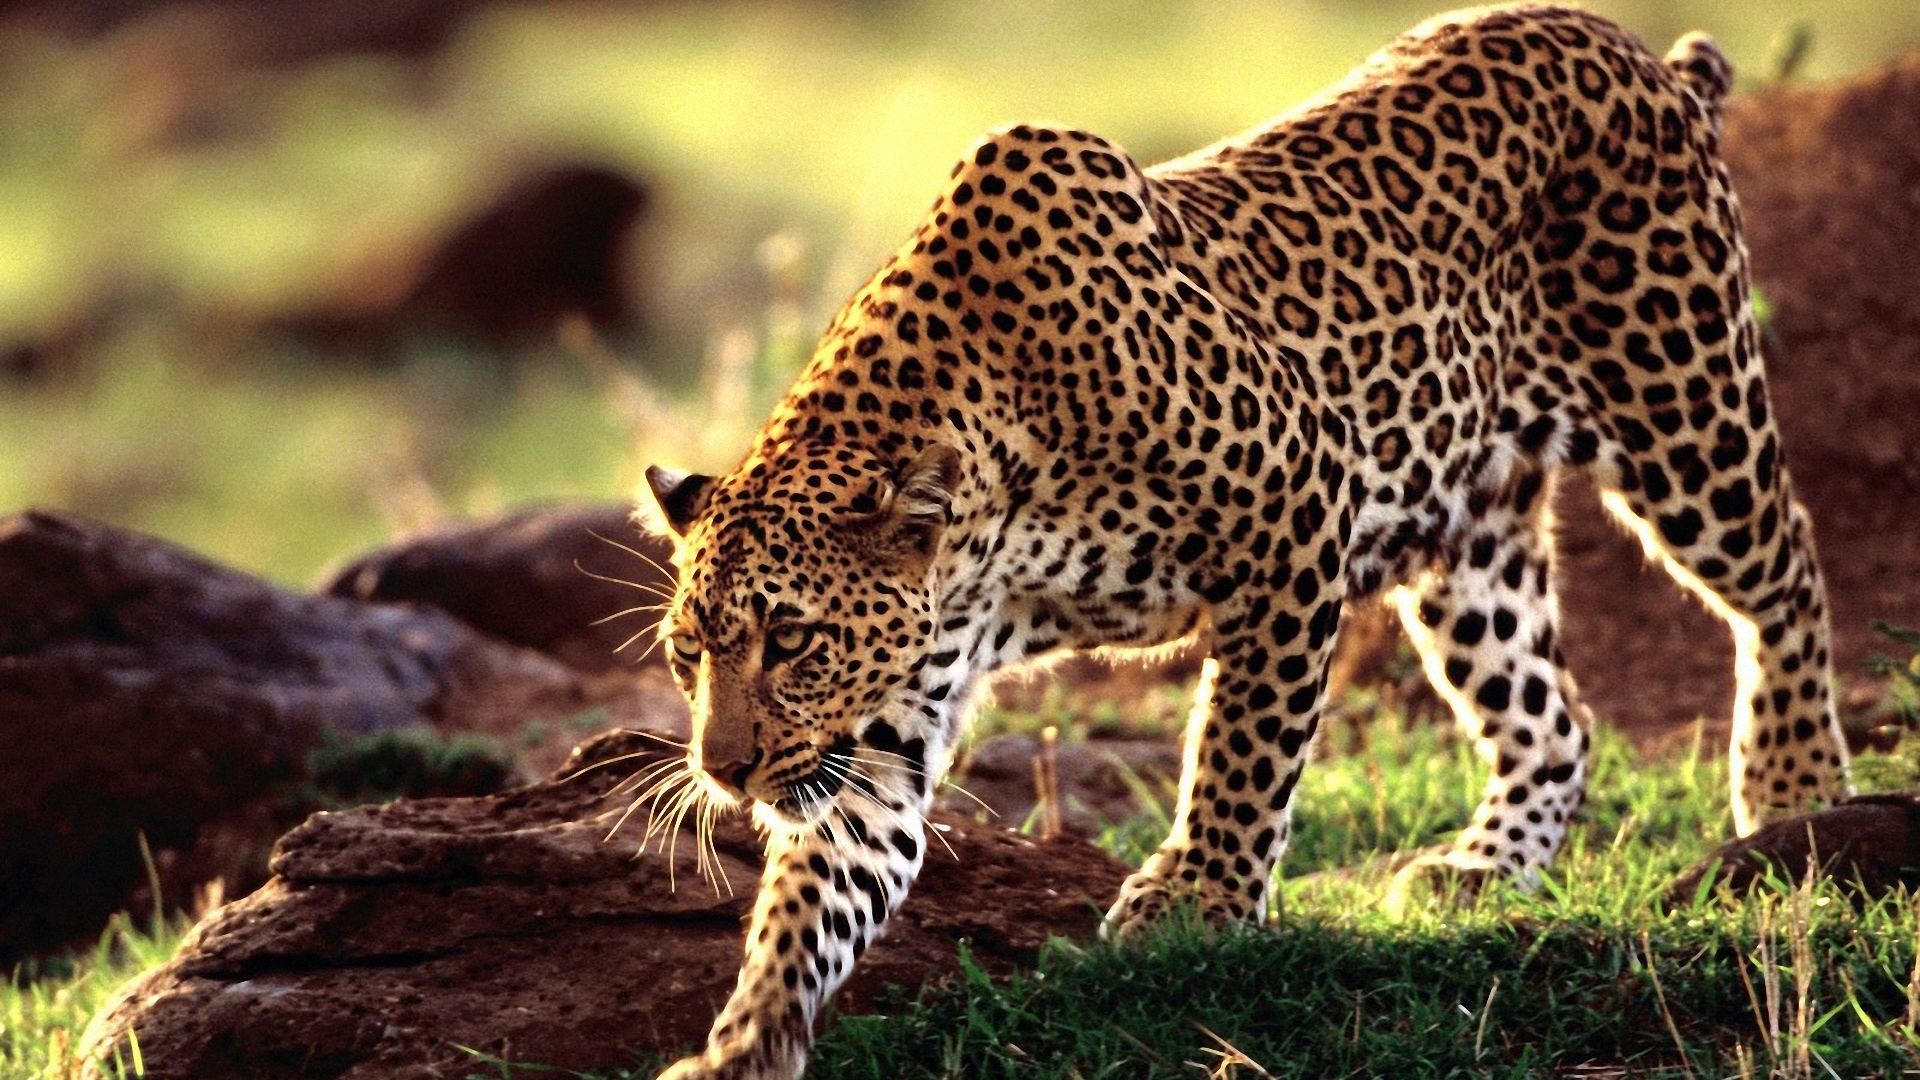 animal print wallpaper hd 1080p - photo #17